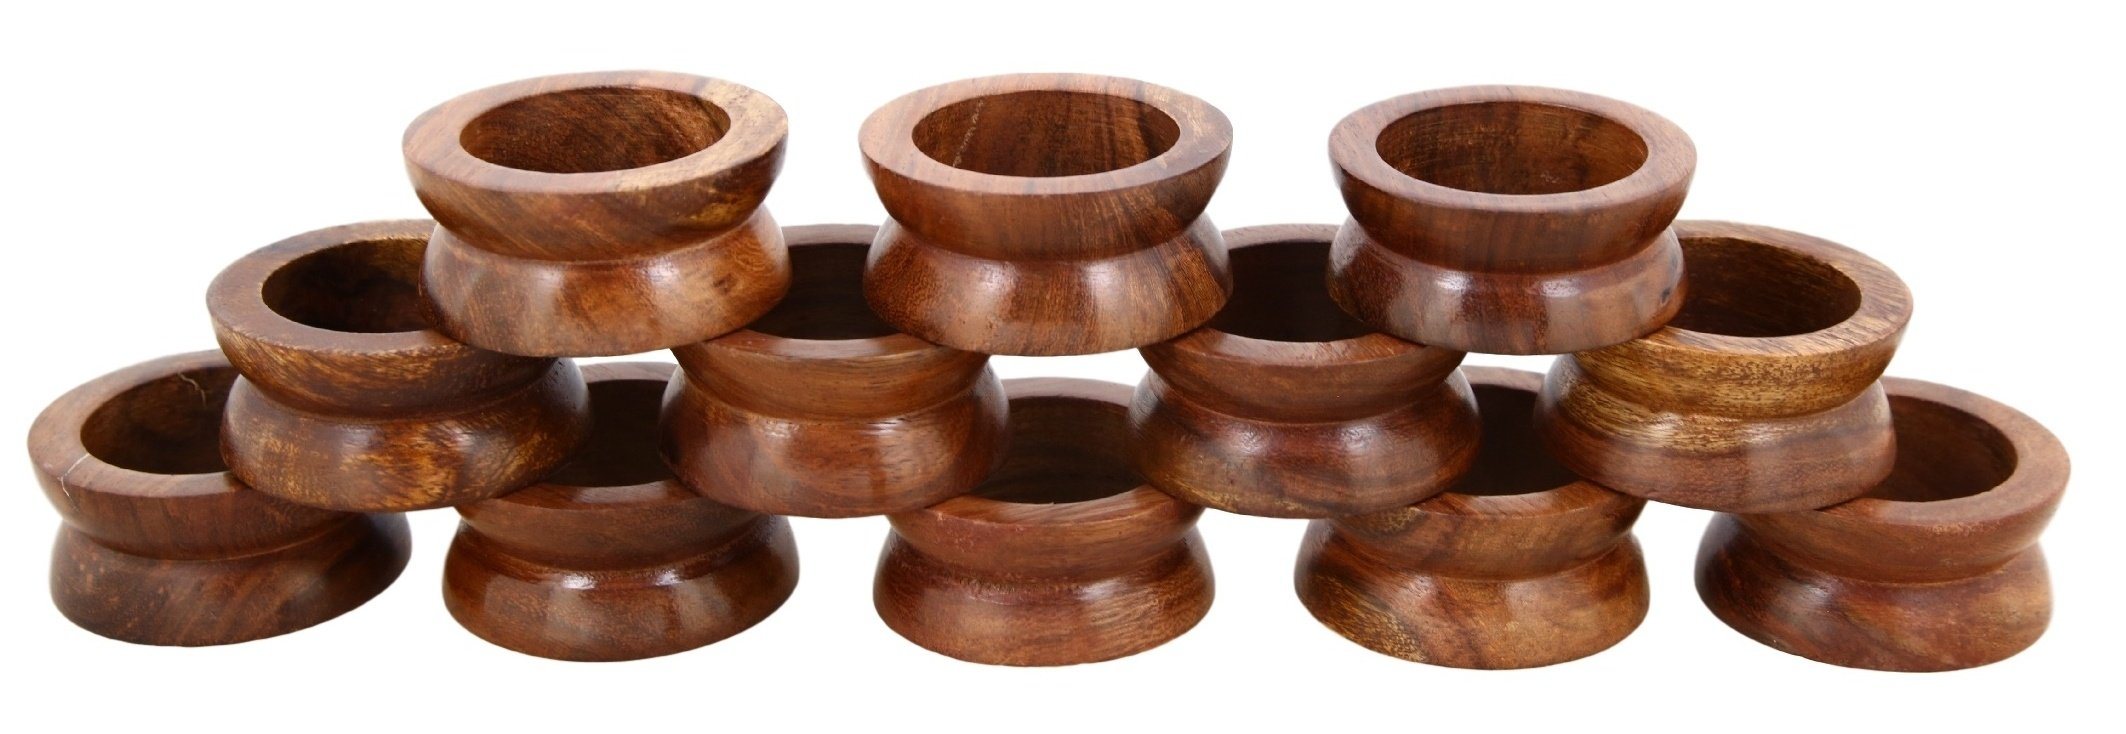 Shalinindia Handmade Wedding Party Decorations Wood Napkin Rings Set of 12 for Dinner Ideas